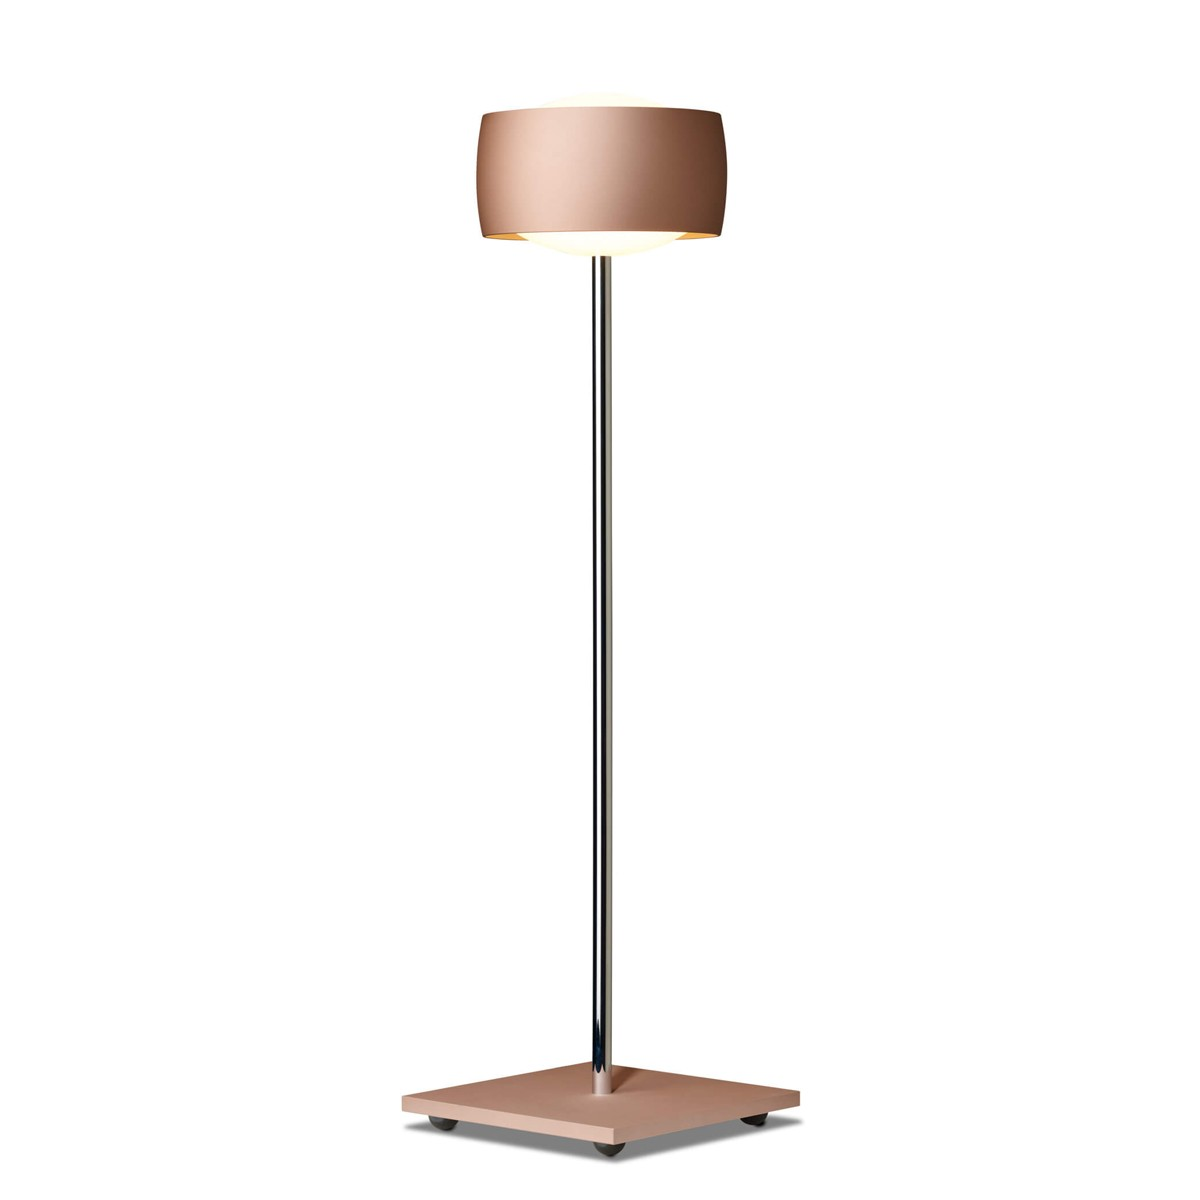 Oligo Grace LED Tischleuchte, Satin copper